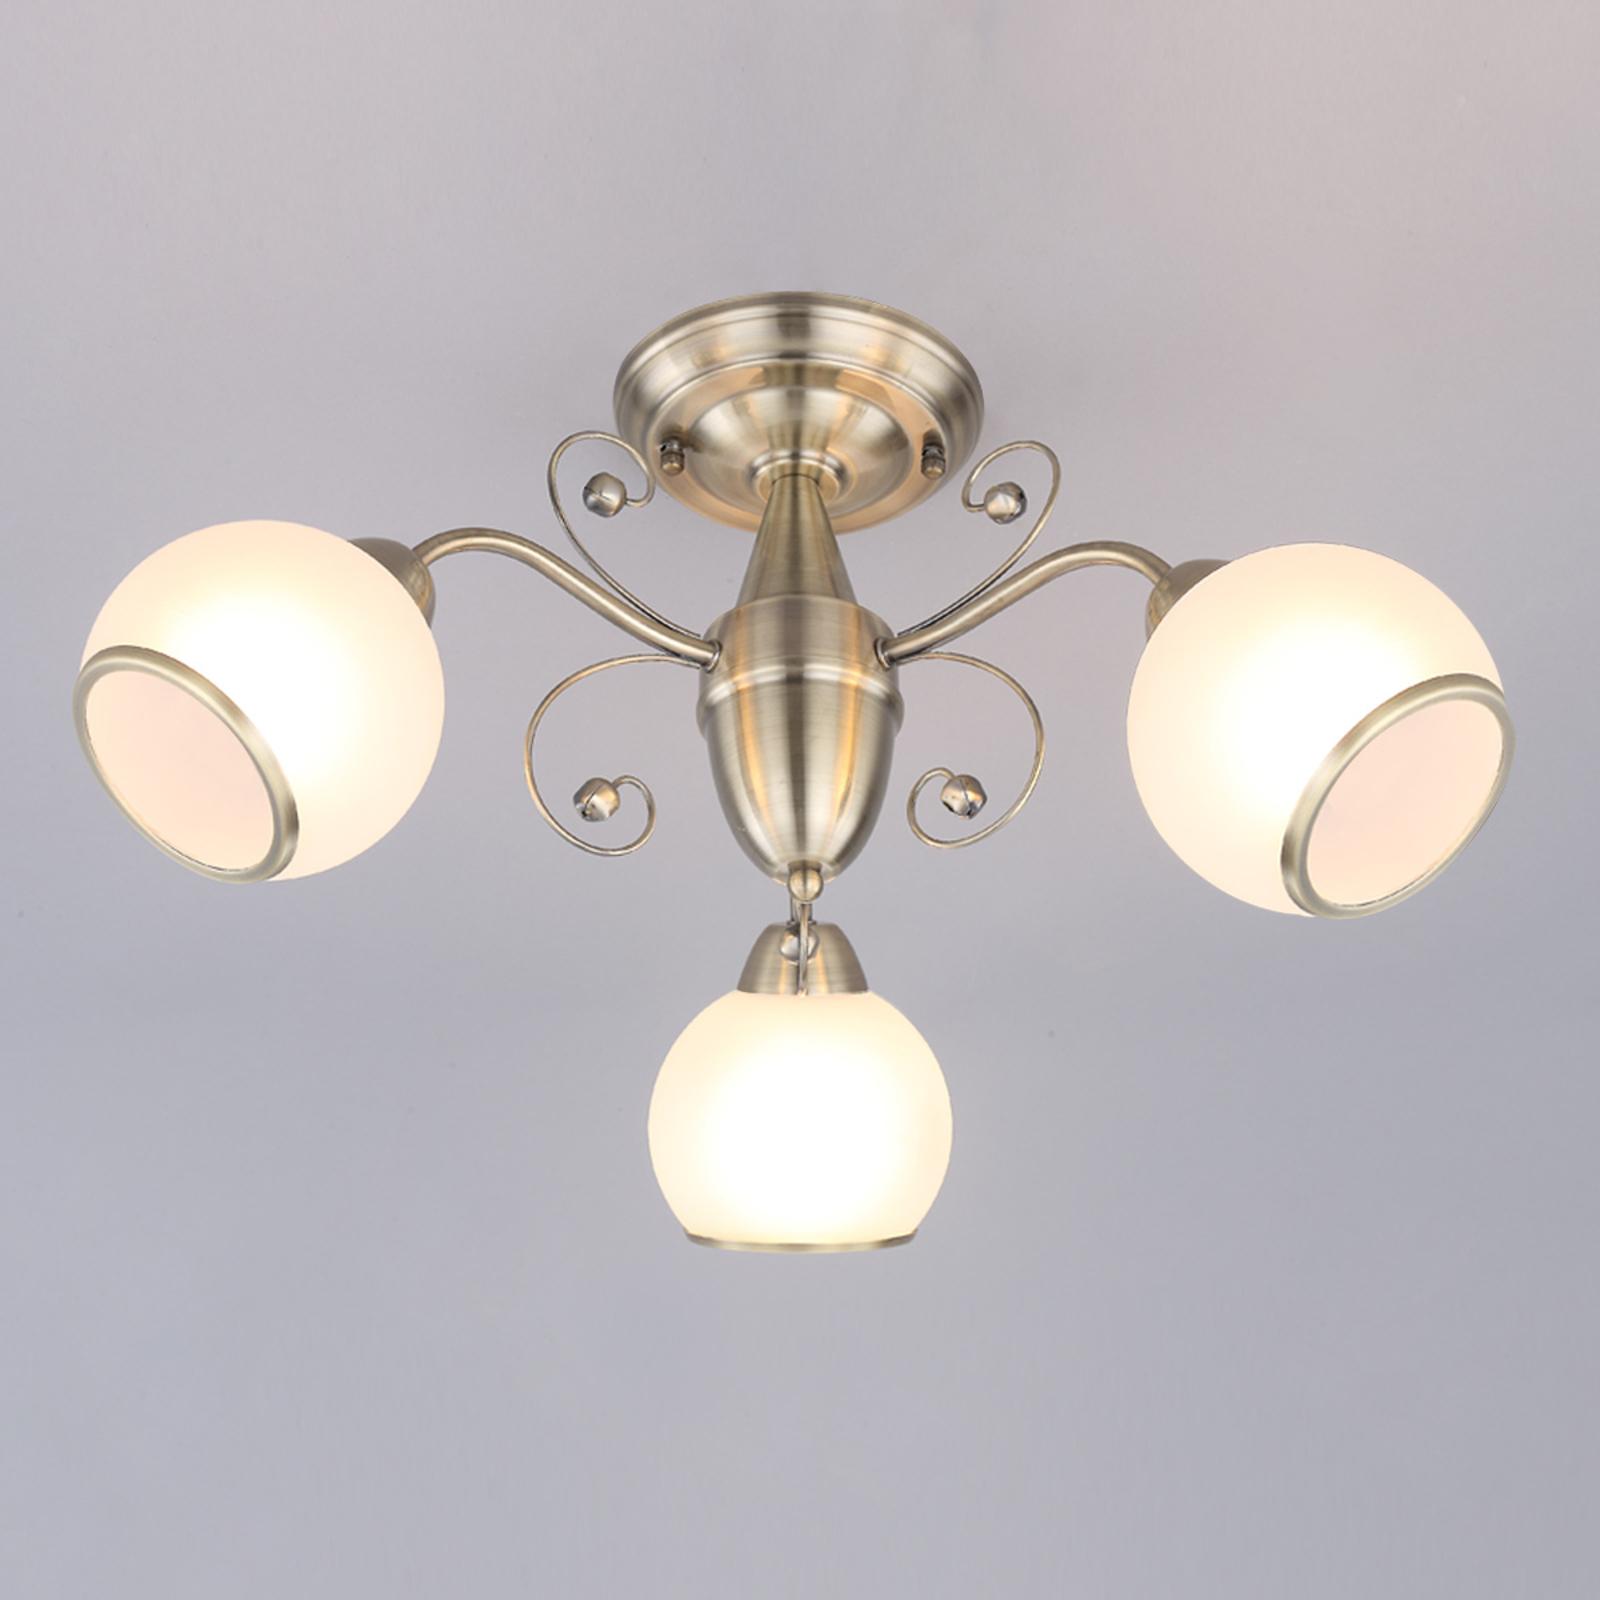 Corentin - joli plafonnier au style classique